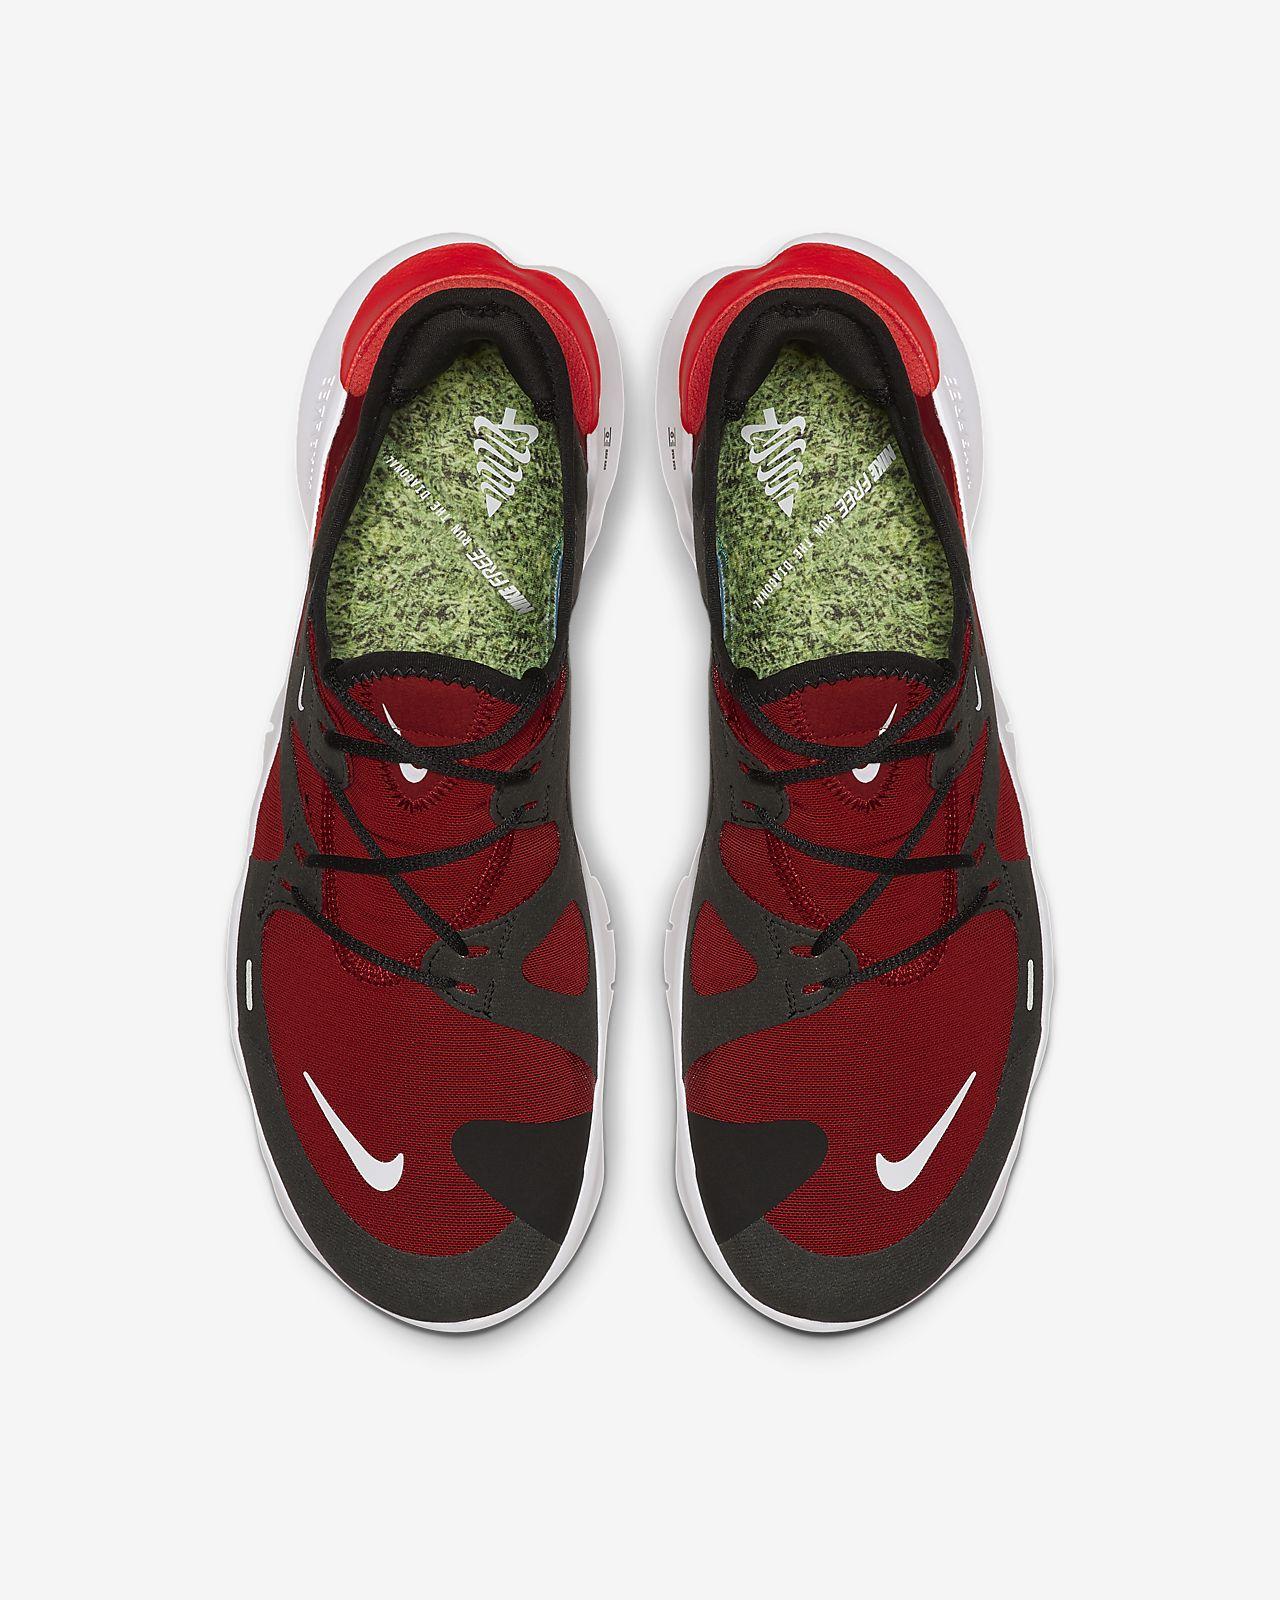 size 40 a0a2e ad533 ... Nike Free RN 5.0 SF Running Shoe